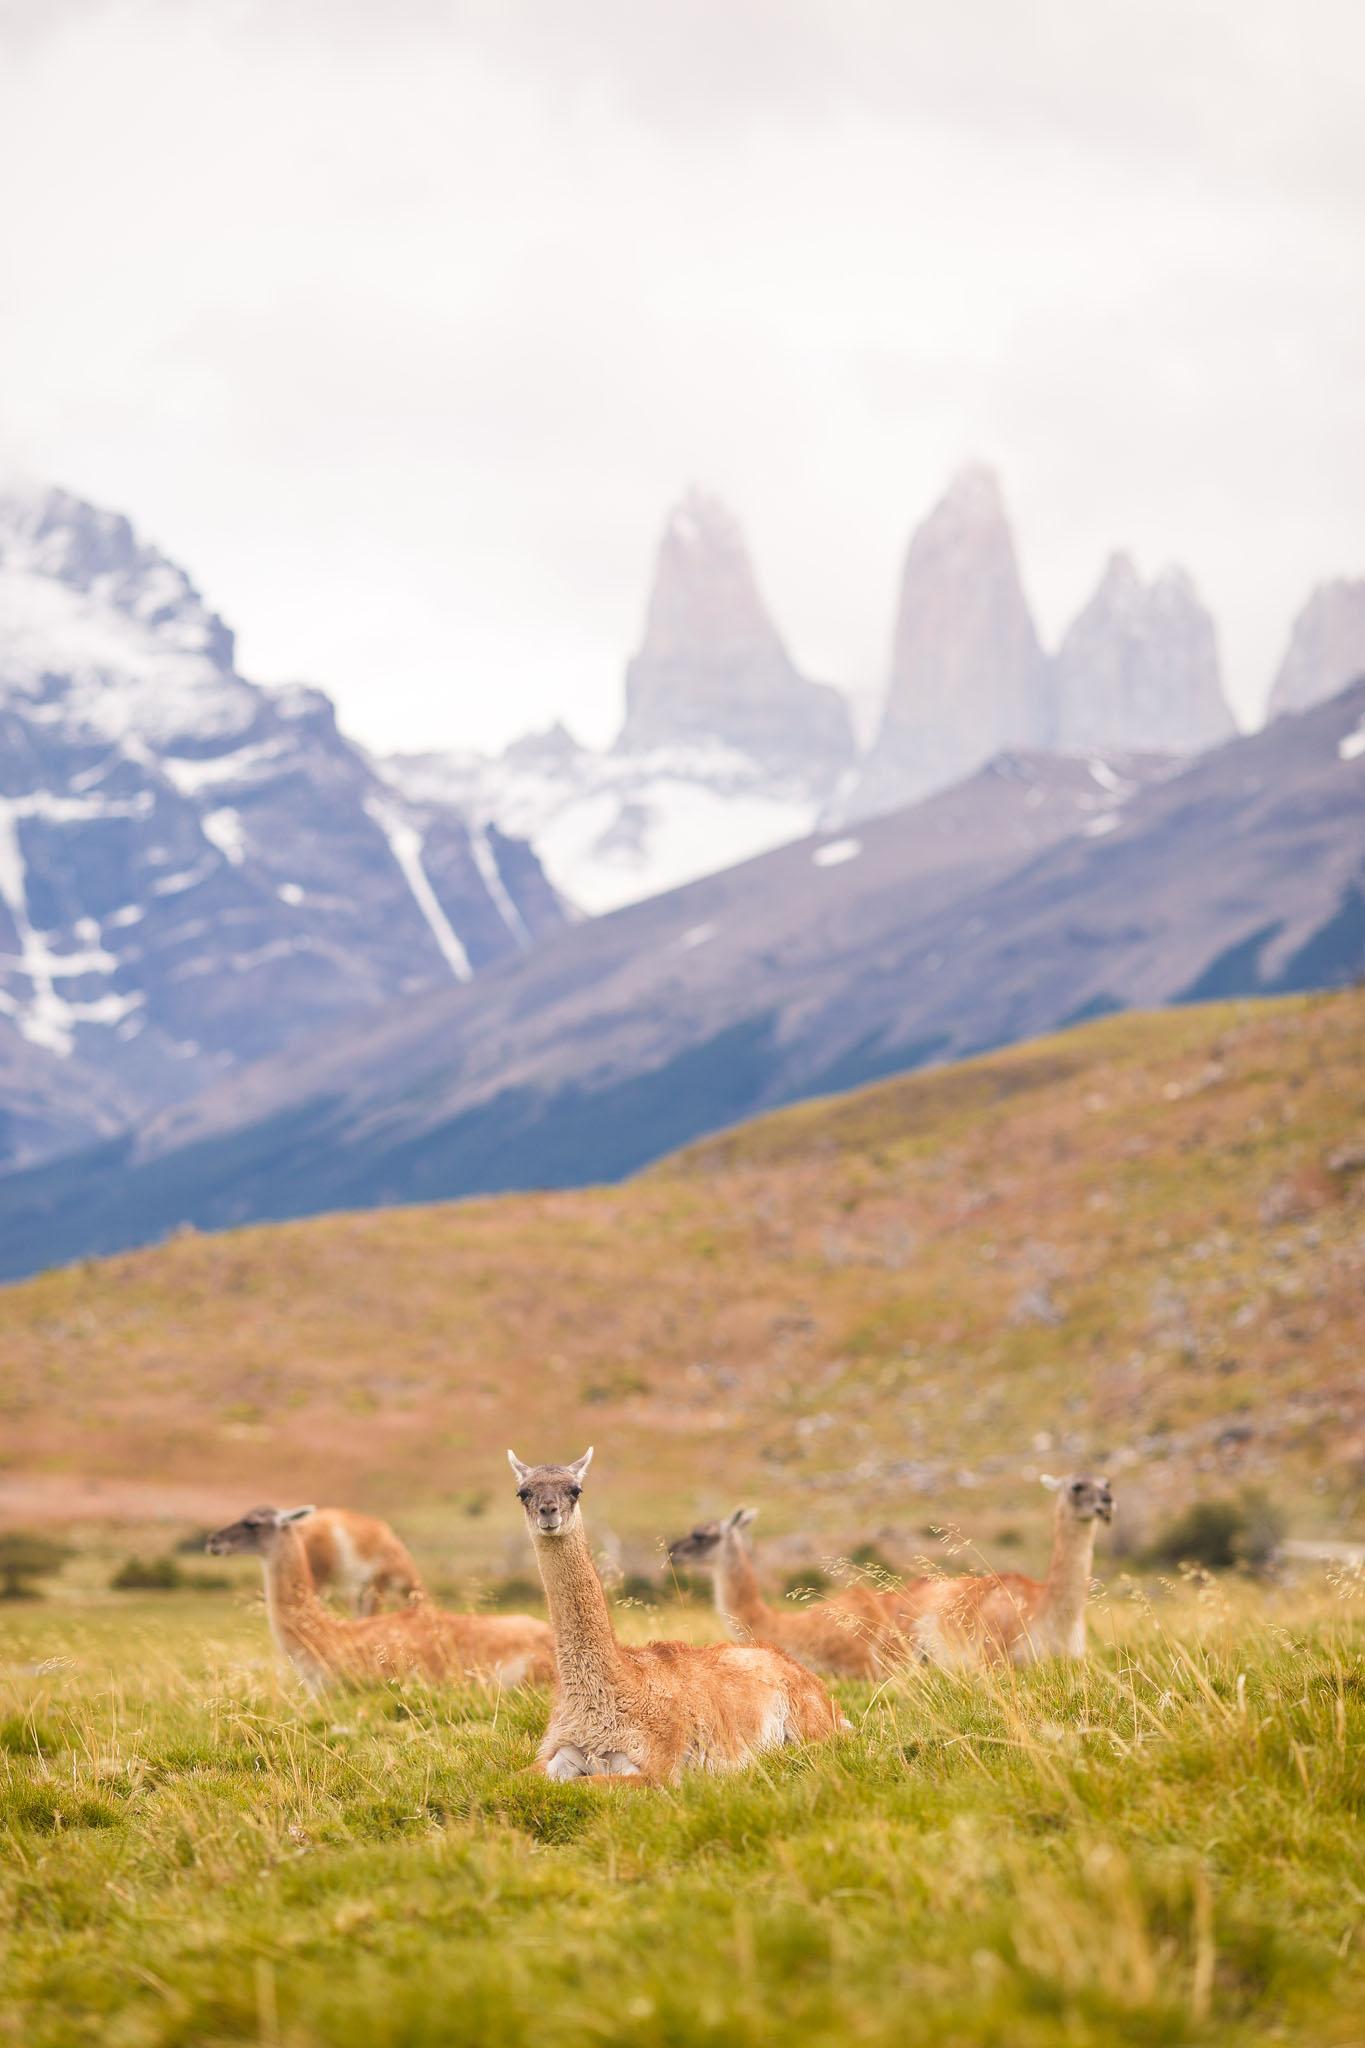 Wedding-Travellers-Overlanding-Destination-Wedding-Chile-Torres-del-Paine-guanaco-lama-llama-tres-torres